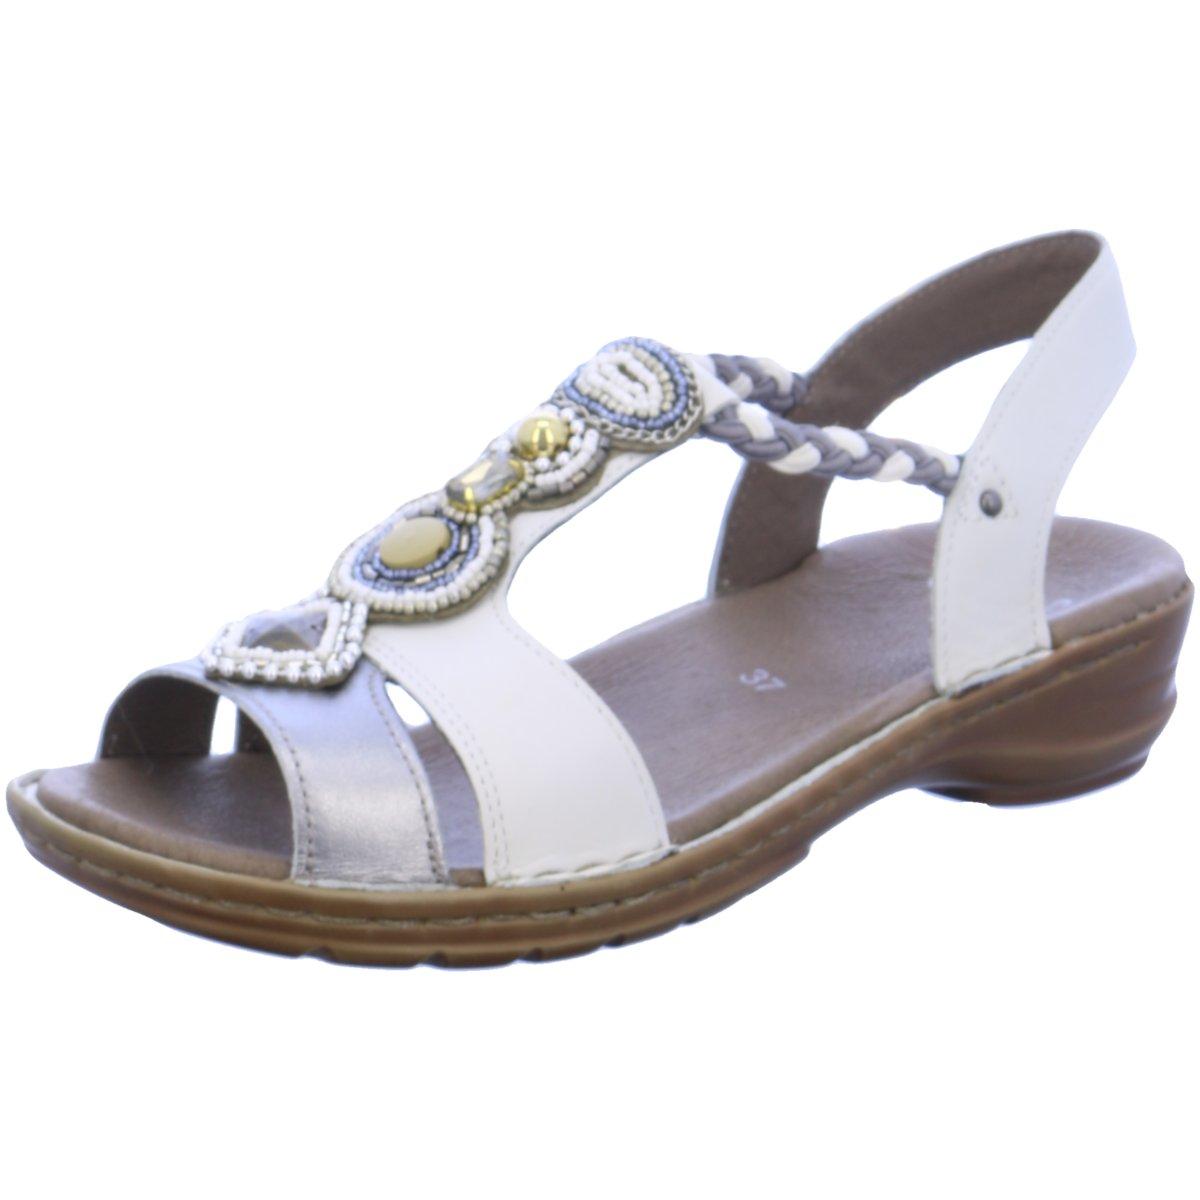 Ara Damen Sandaletten Hawaii -G- 12.37275.05 grau 258410